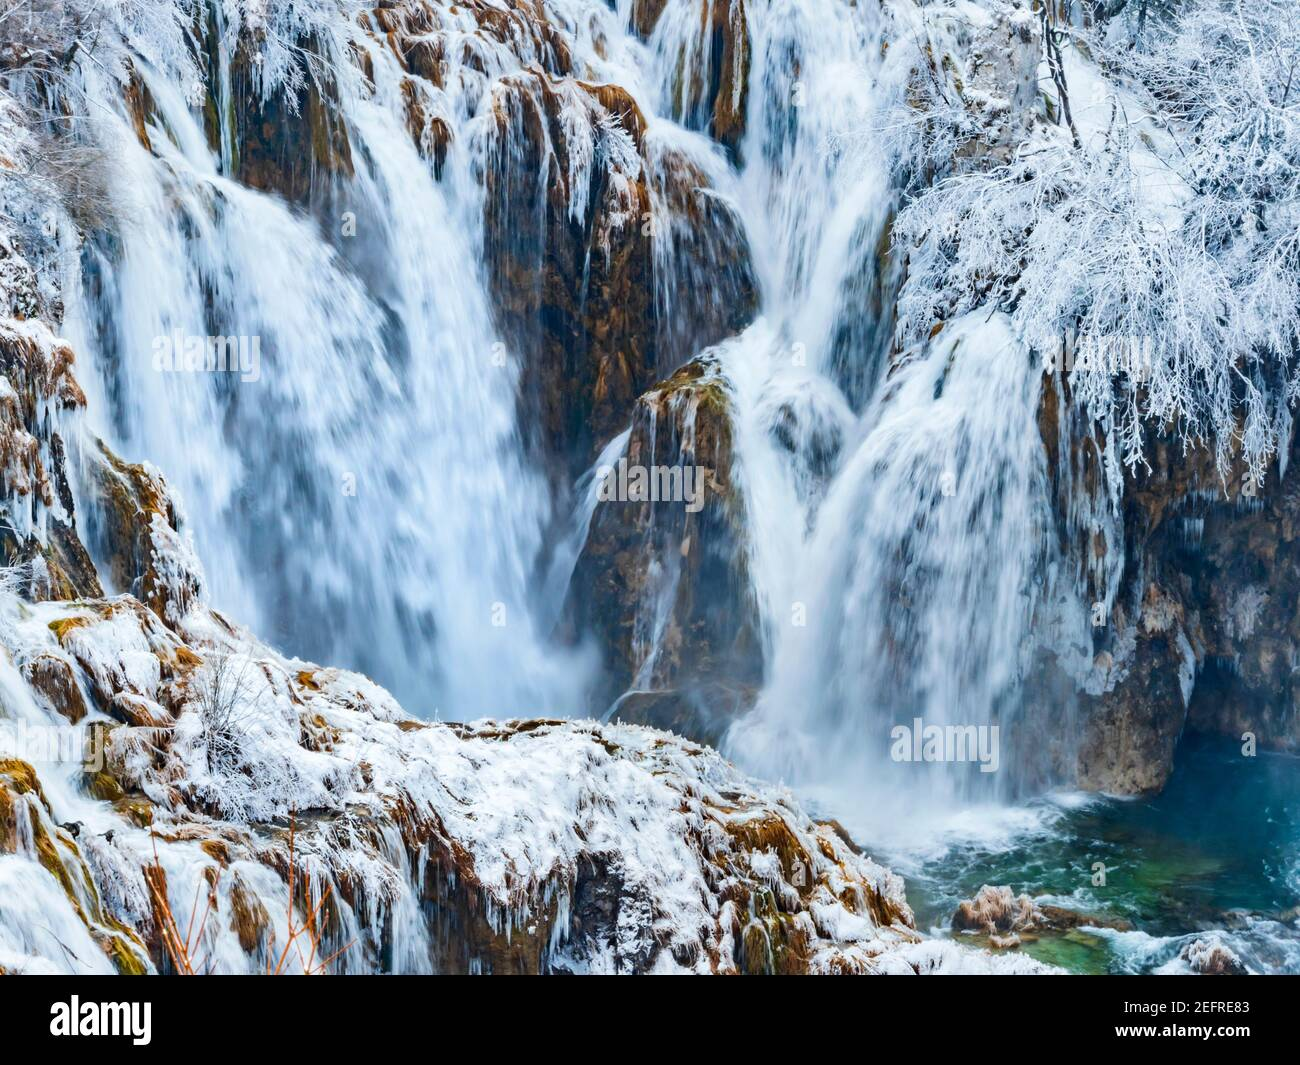 Dynamic Winter season waterfalls in Plitvice lakes Croatia Europe with snow ice waterflow flowing flow atop rocky rough terrain sprinkling water Stock Photo